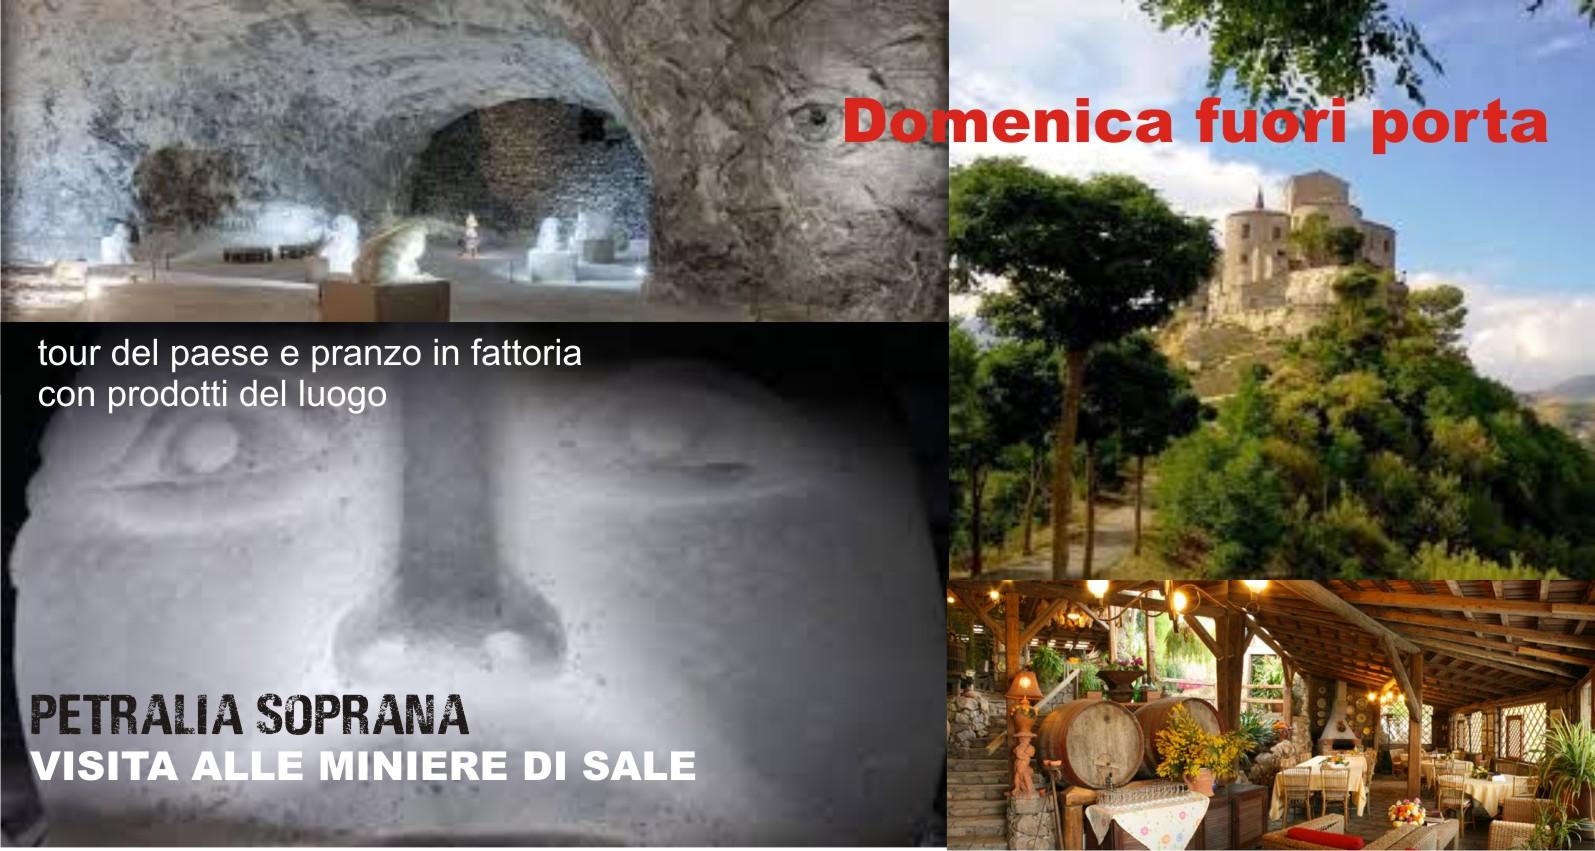 Promofestival - Petralia Soprana